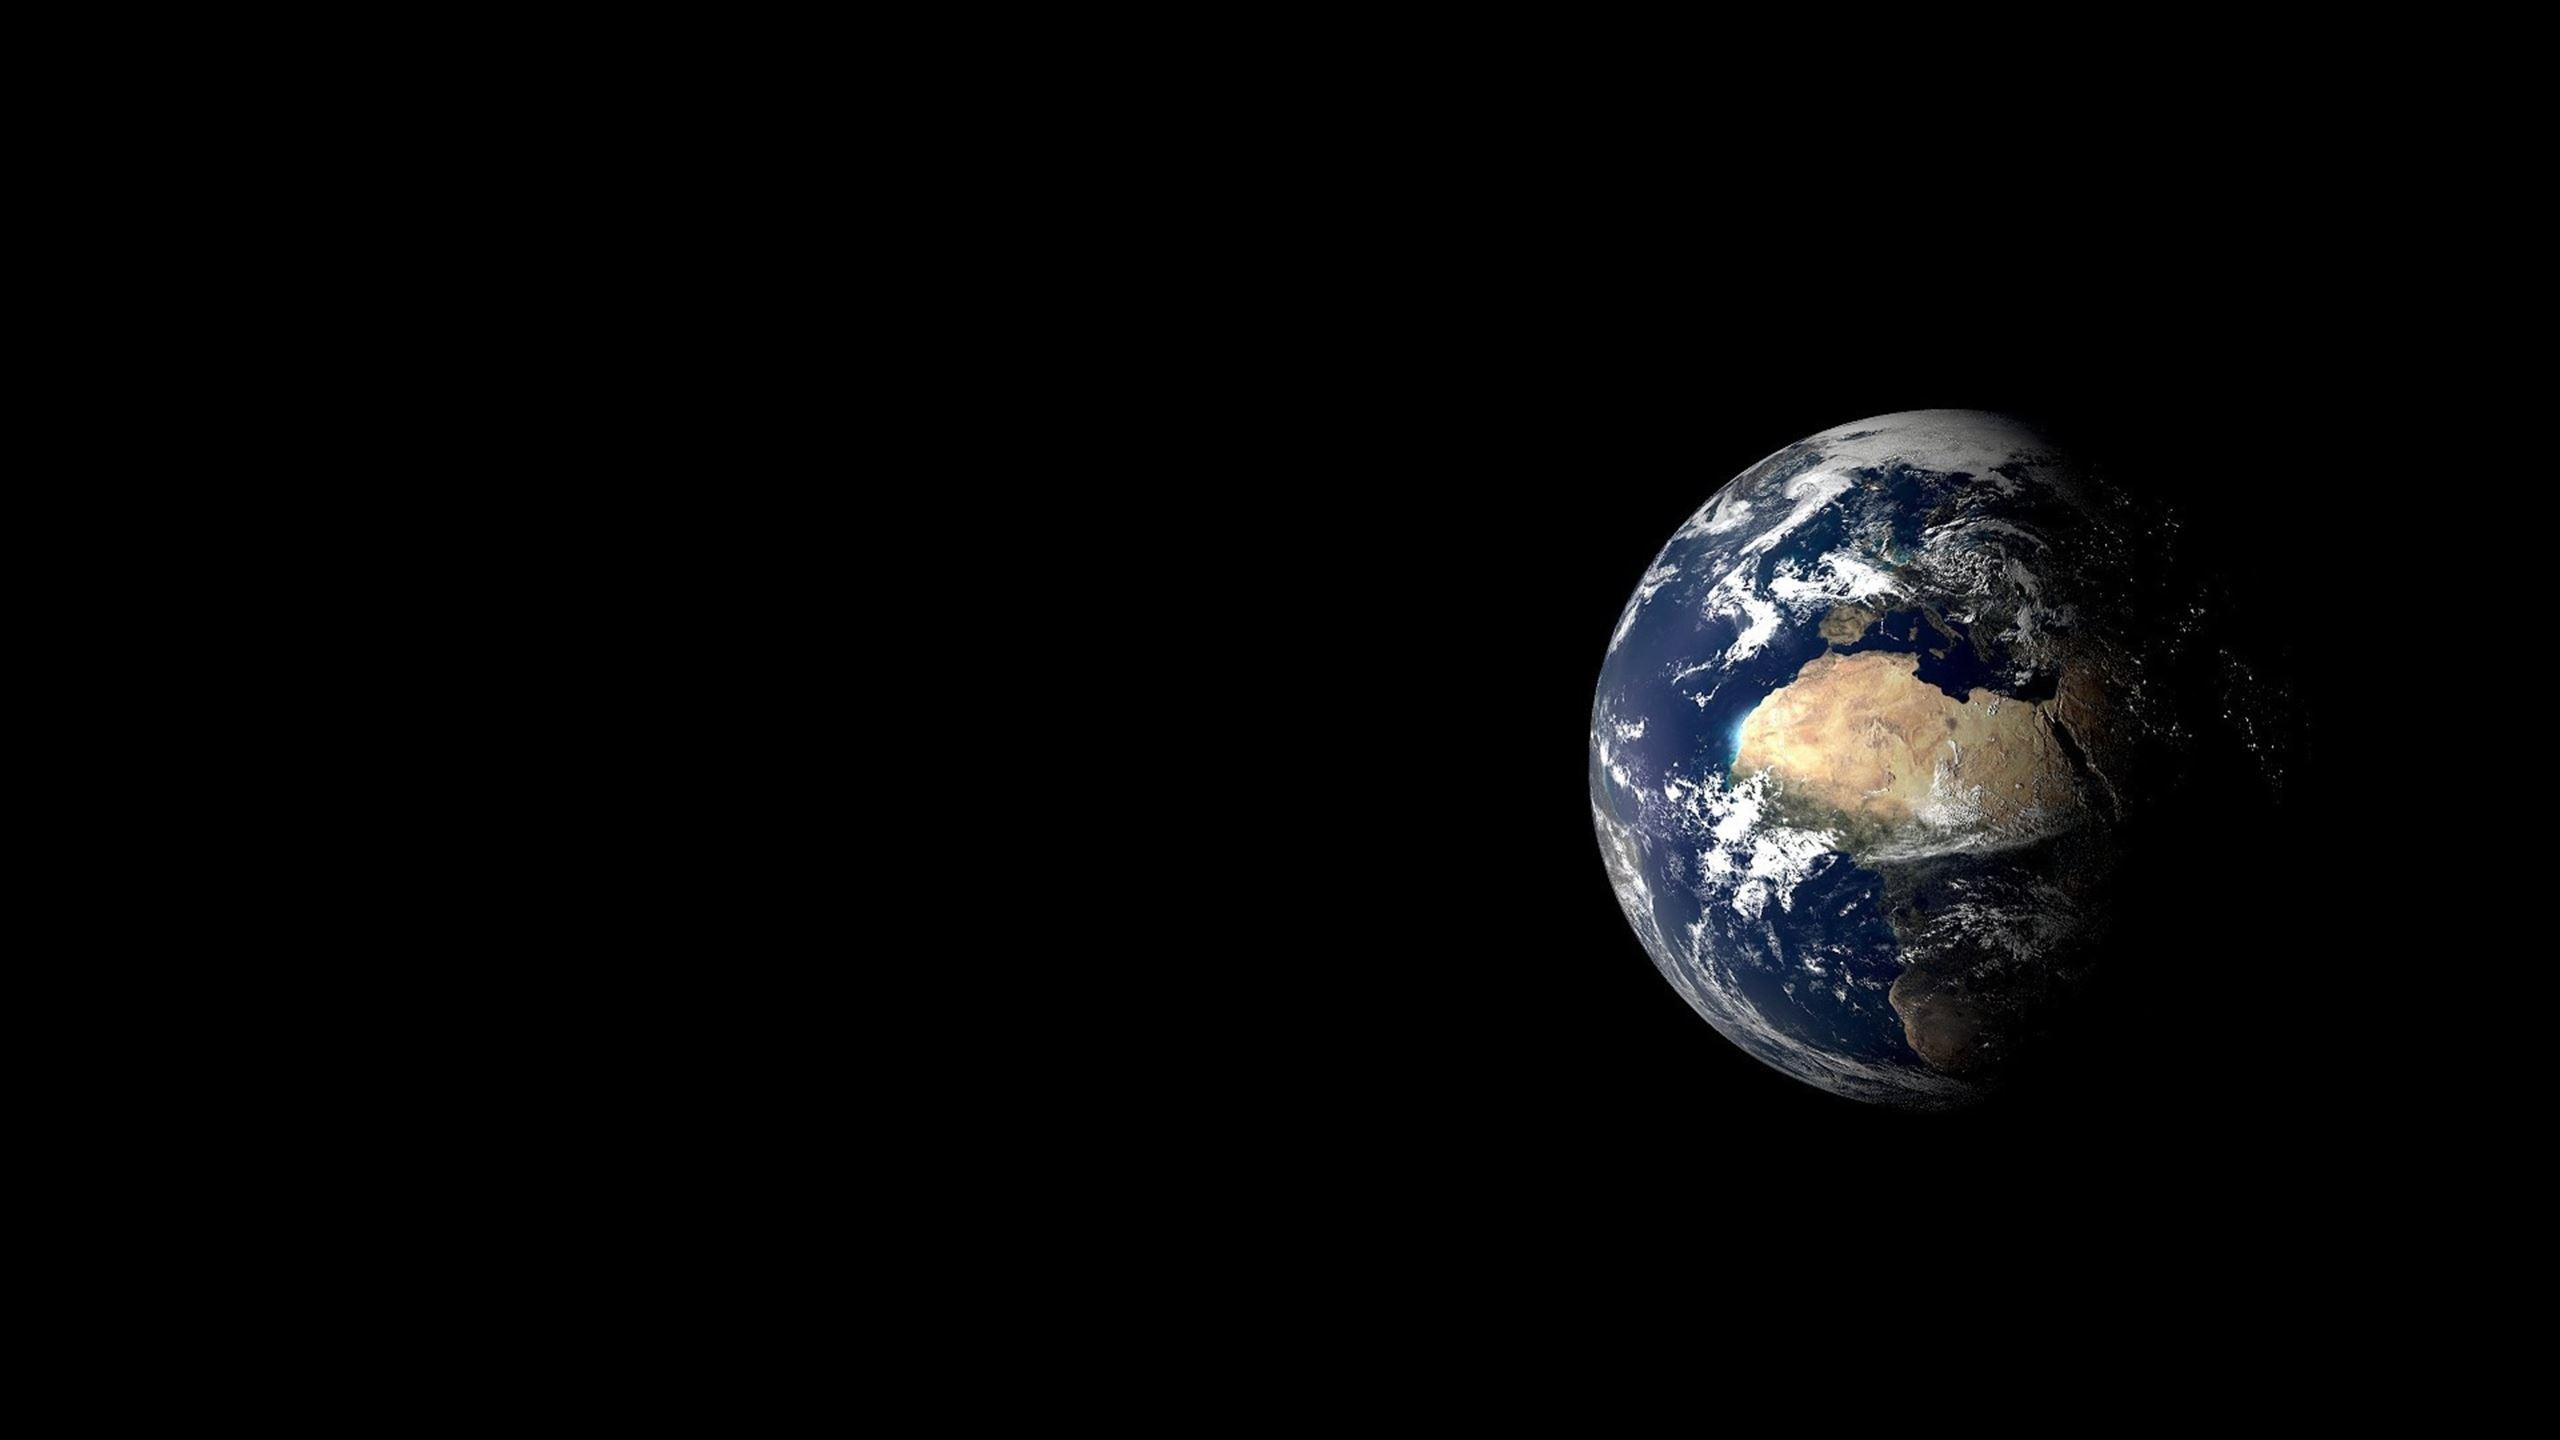 earth 1 mac wallpaper download free mac wallpapers download